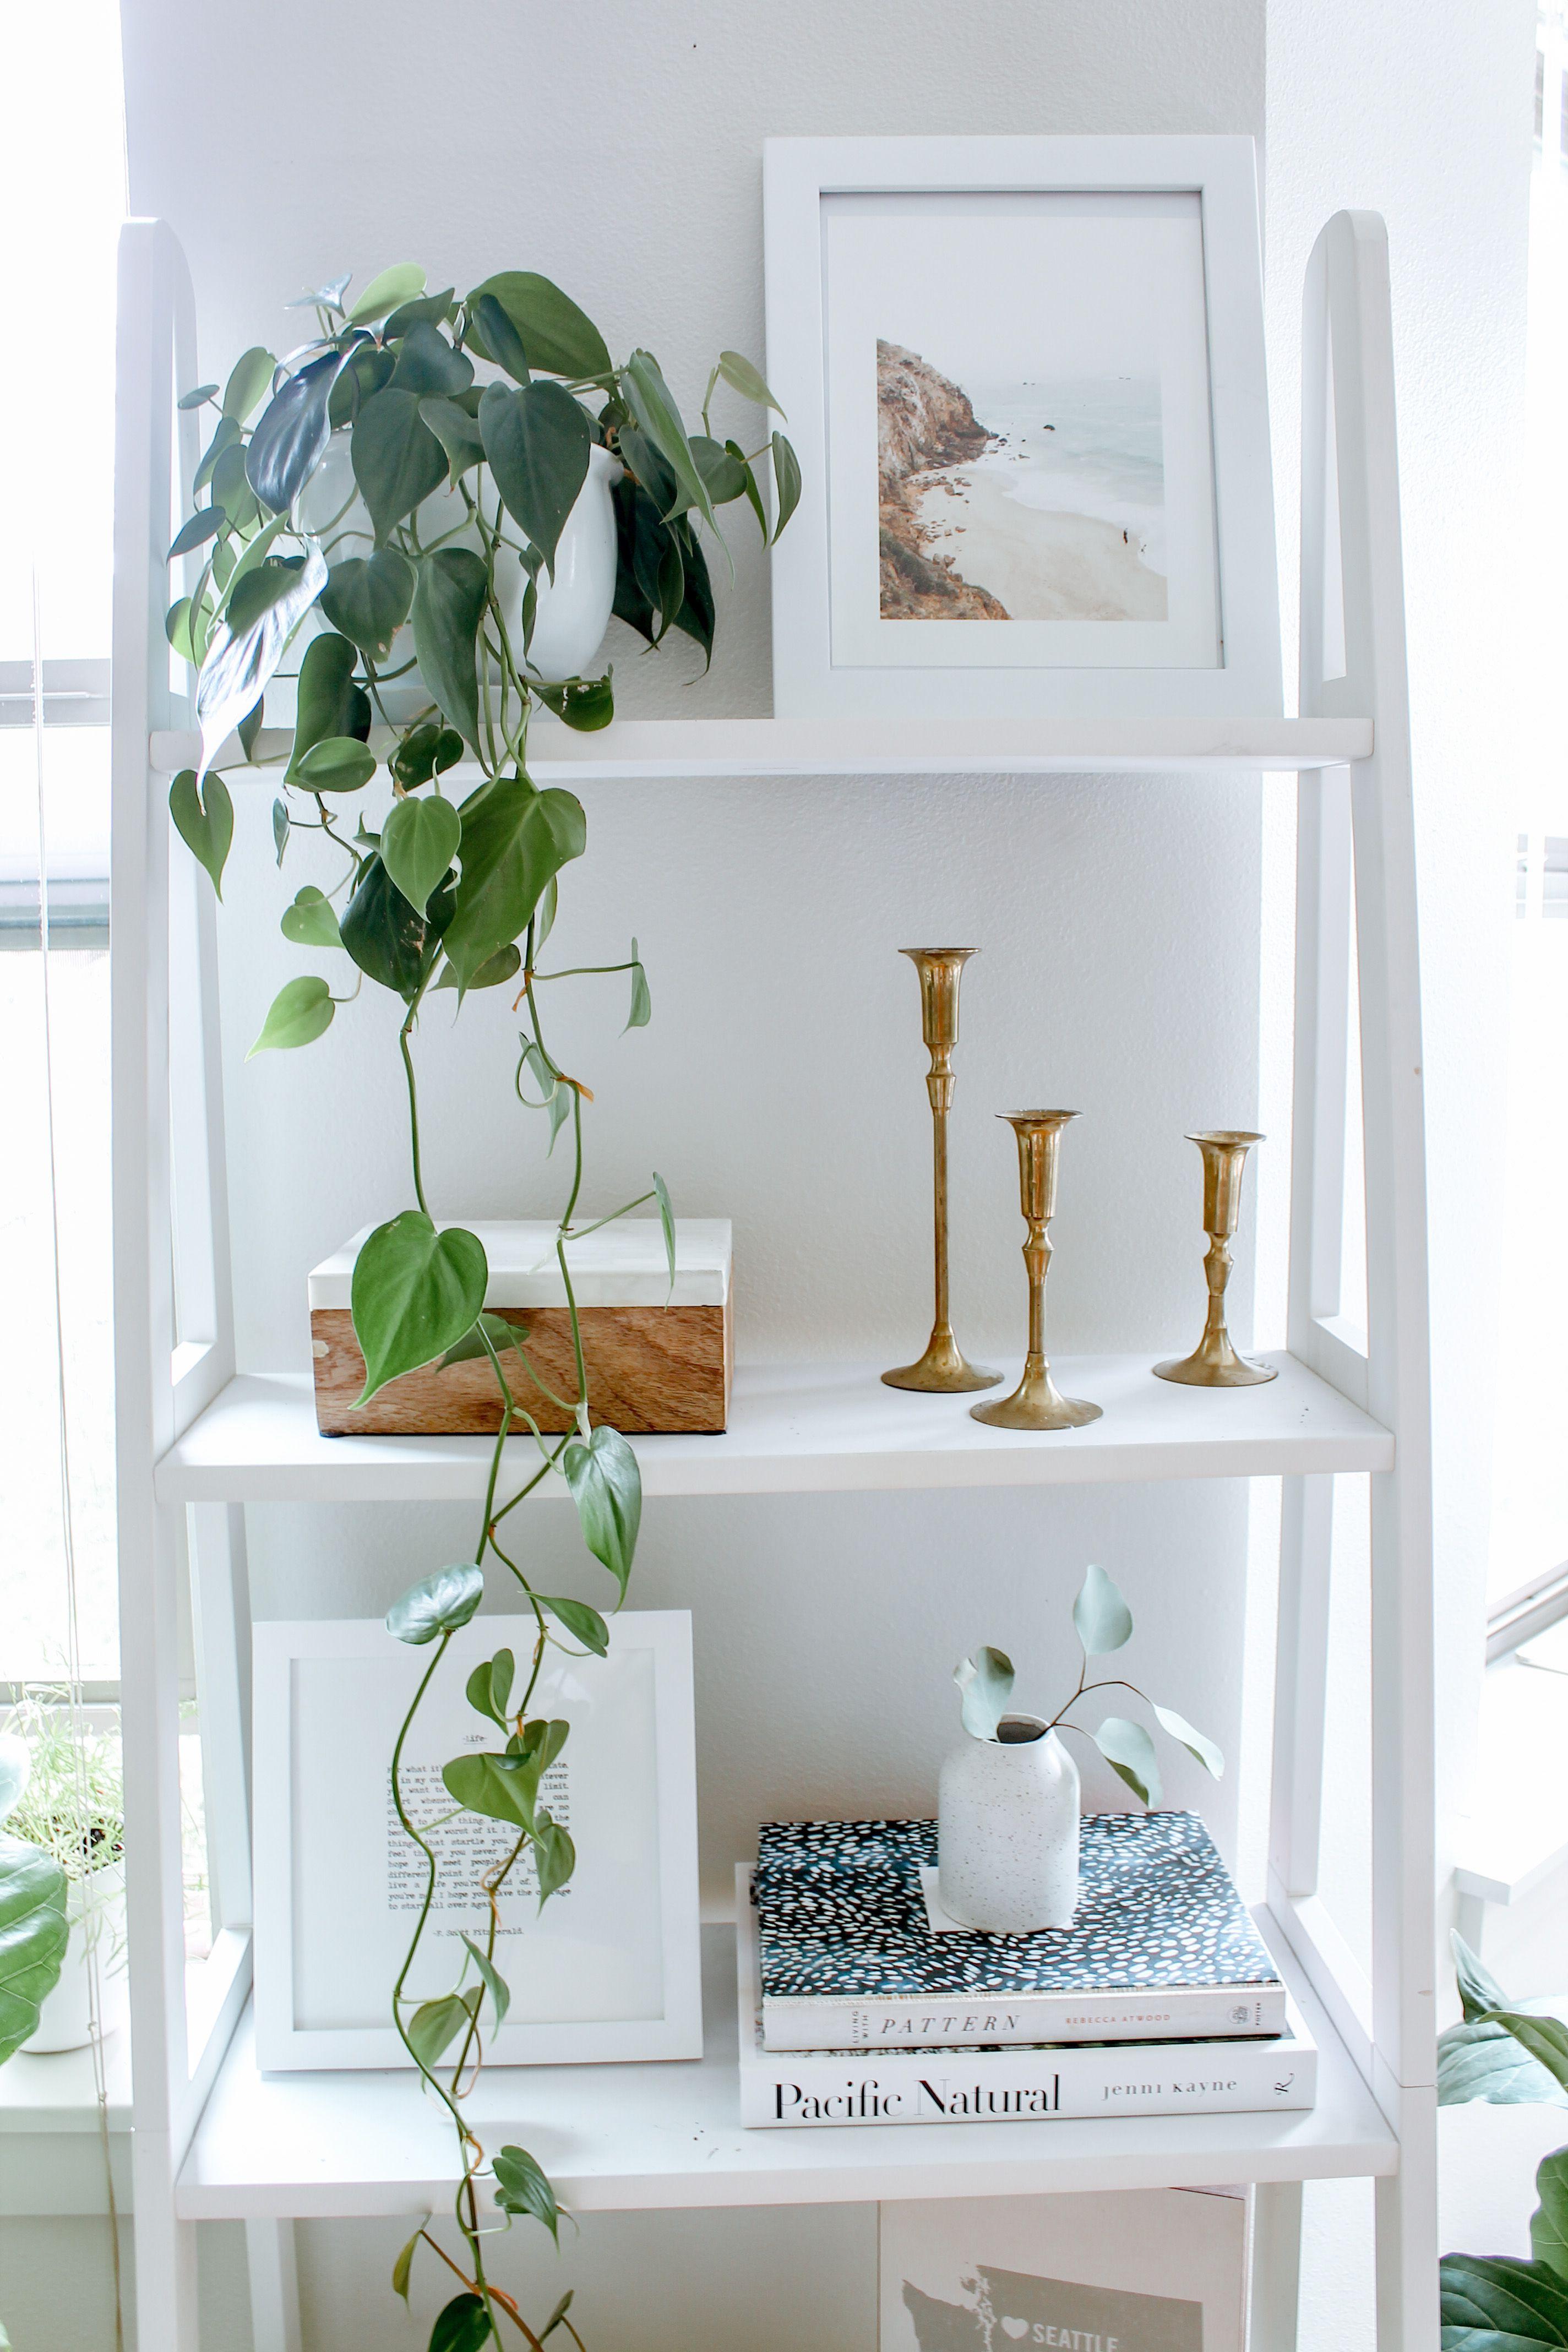 #ShelfStyling #Shelf #LadderShelf #HomeDecor #InteriorDesign #InteriorDecorating #DreamHome #ApartmentDecor #ShelfDesign